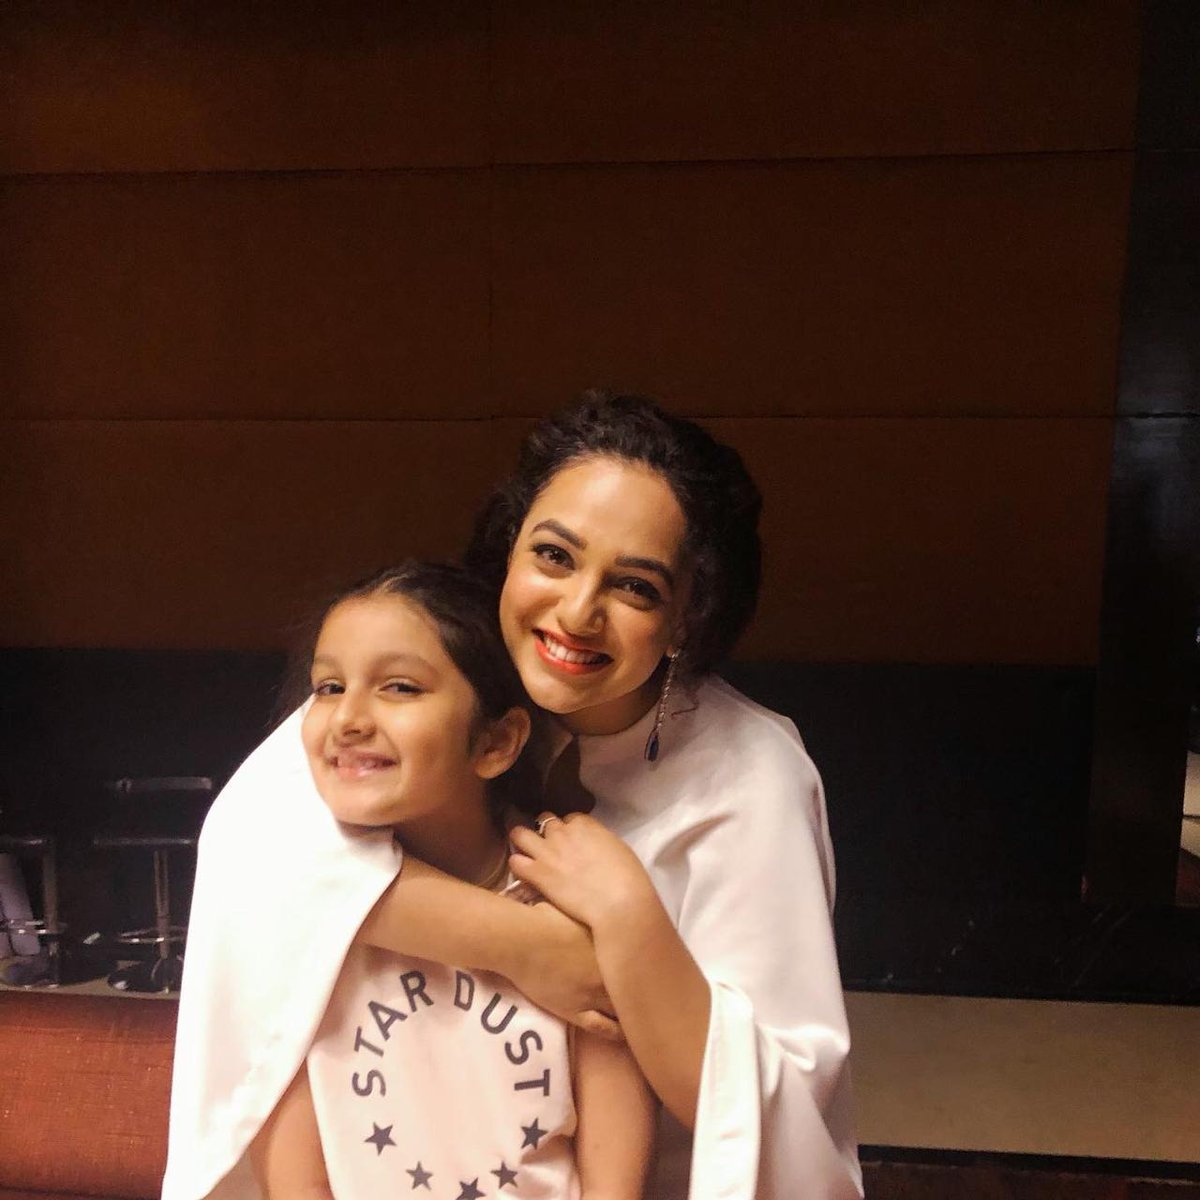 Can't get better...Elsa and baby Elsa 💕💕💕 @MenenNithya @DisneyIndia